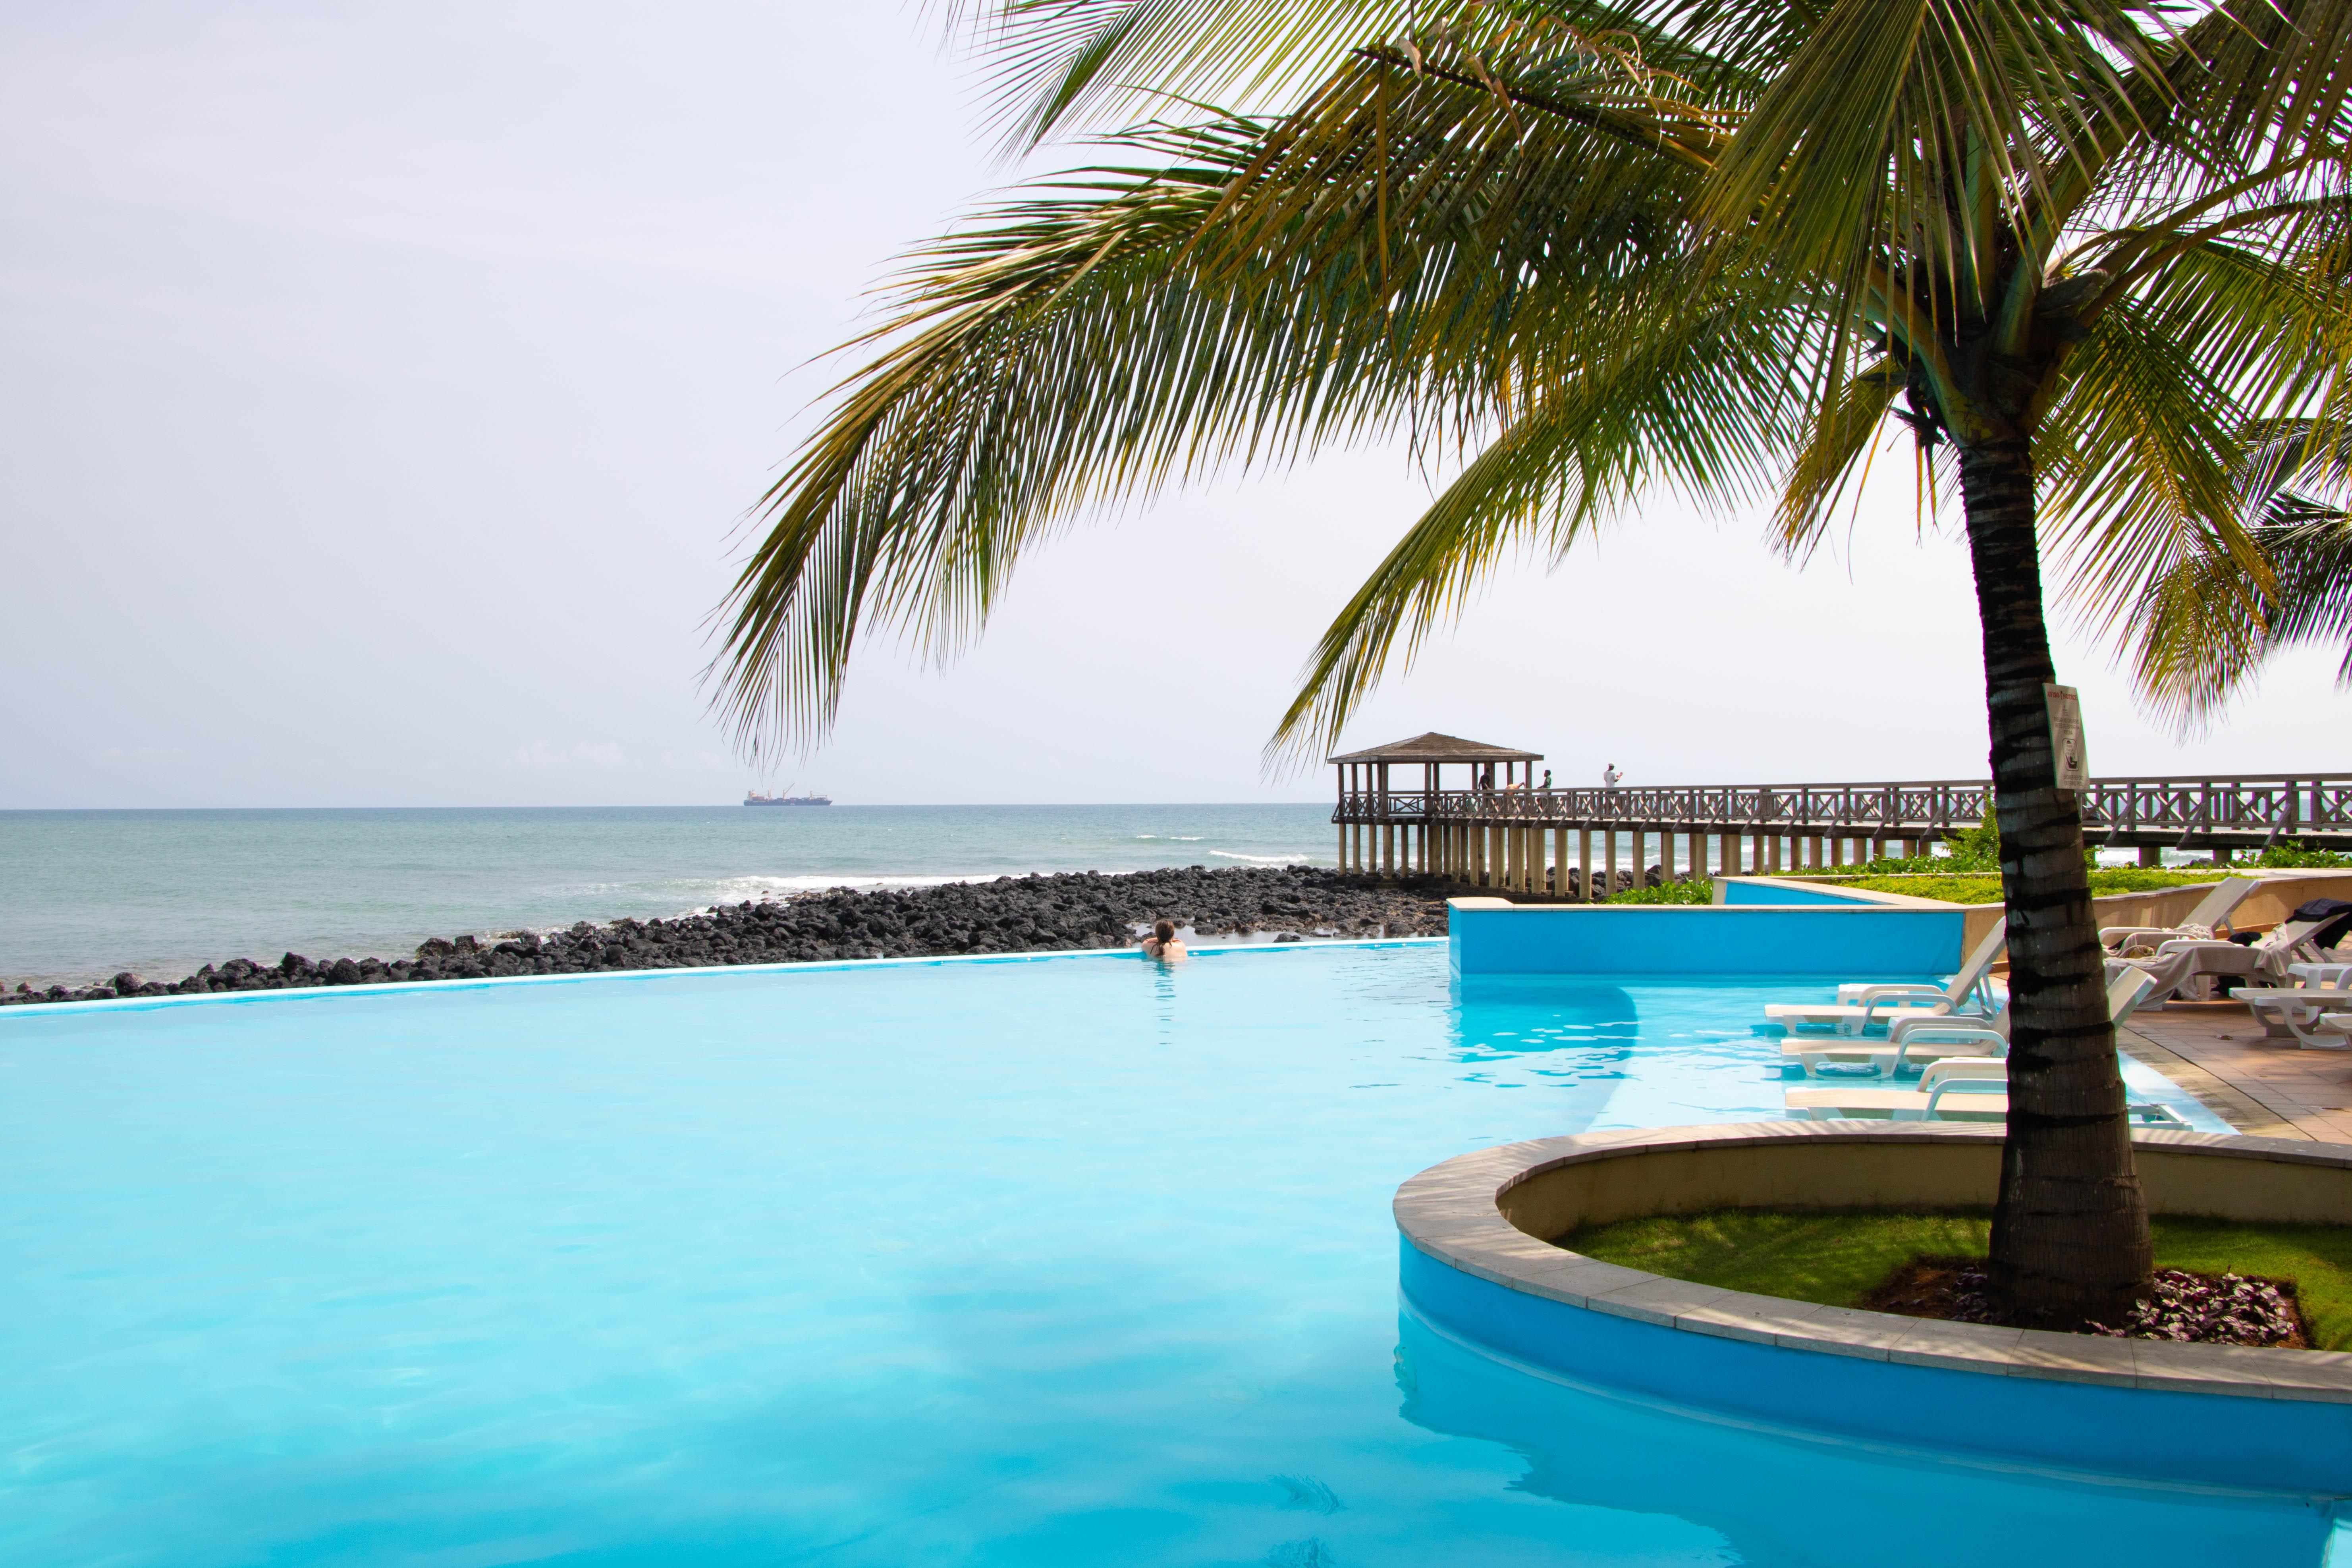 Sao Tome Hotels